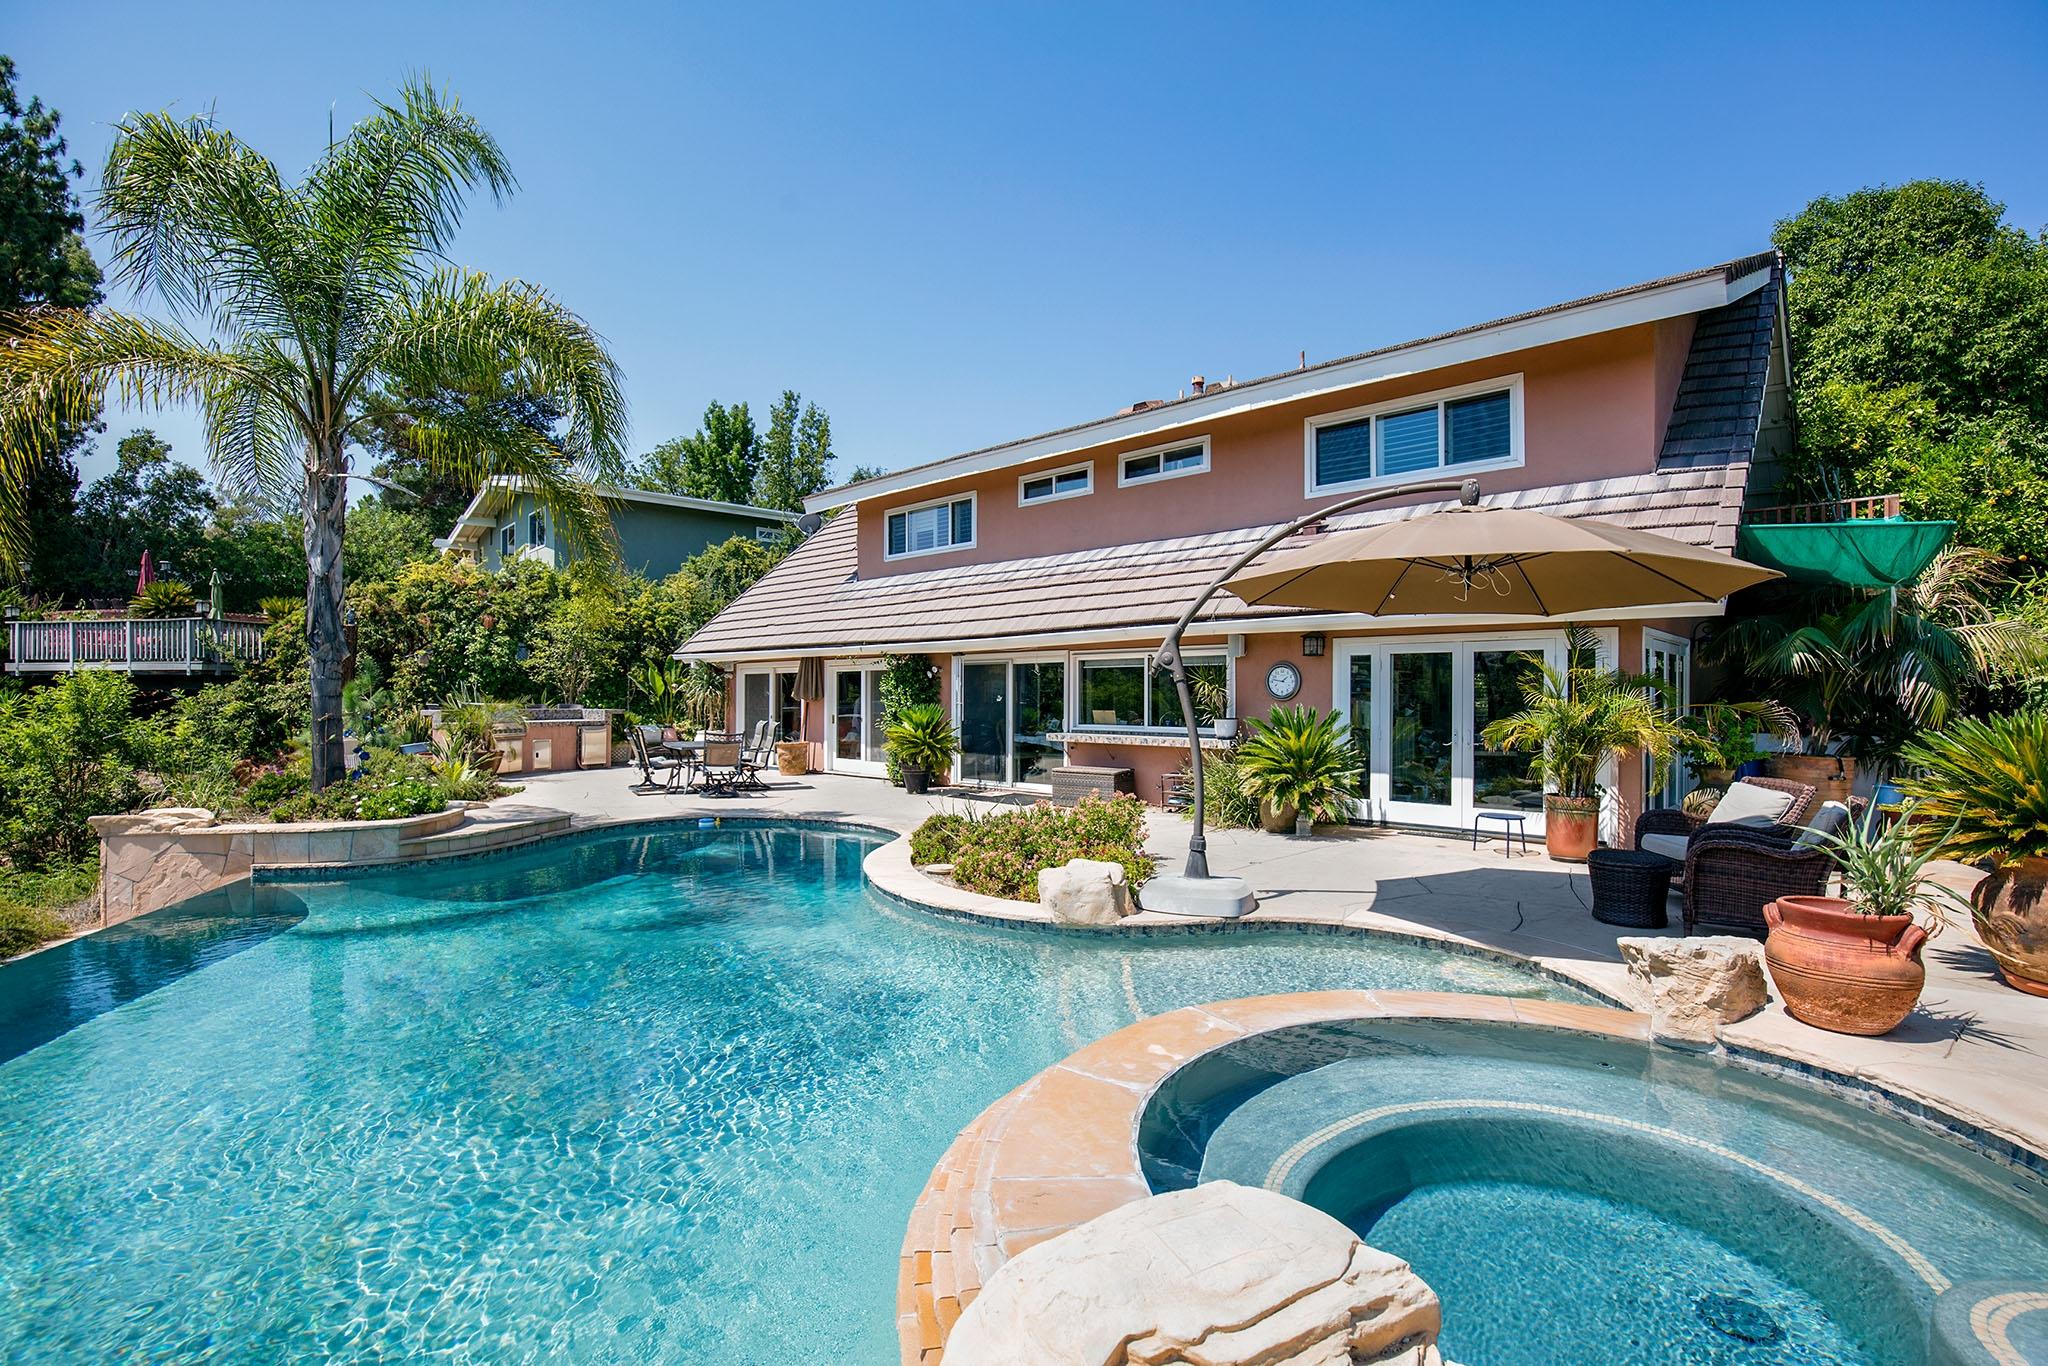 Incredible Entertainer's View Home, Tarzana, CA